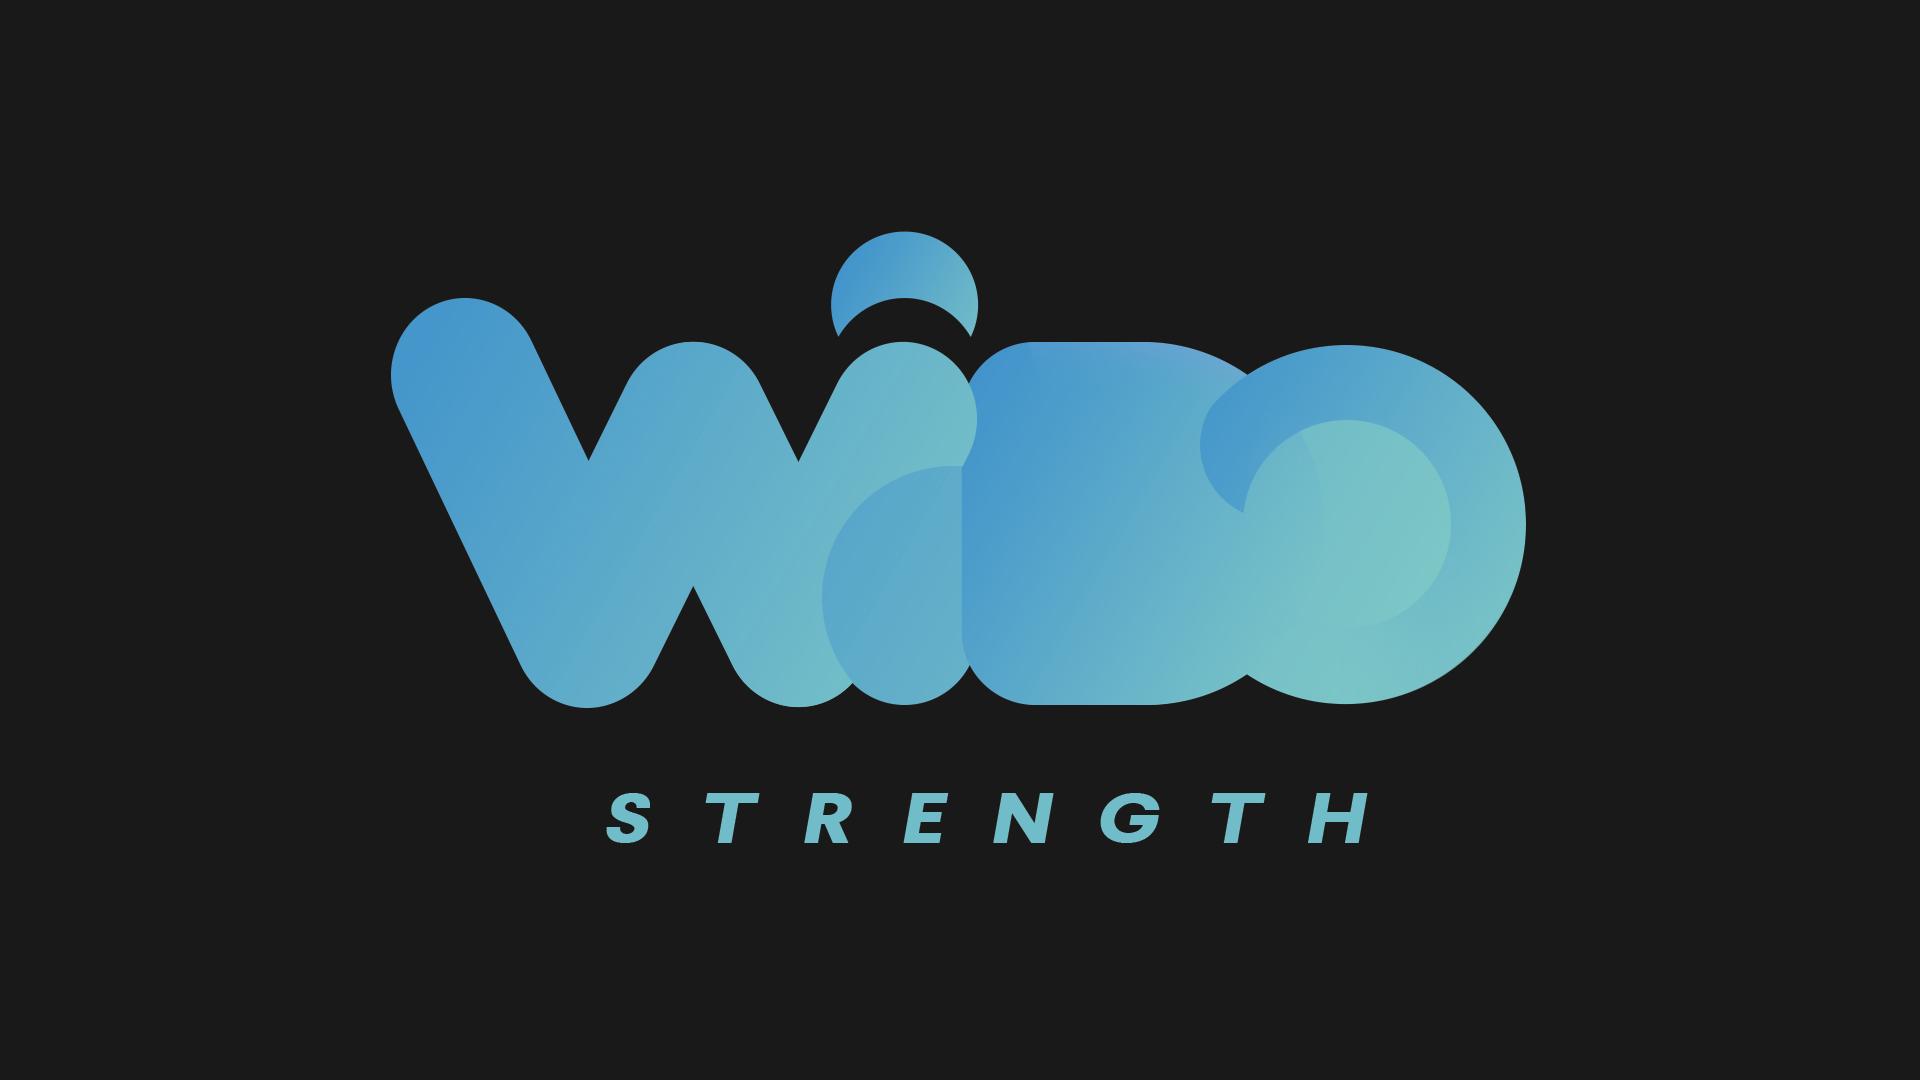 widostrength